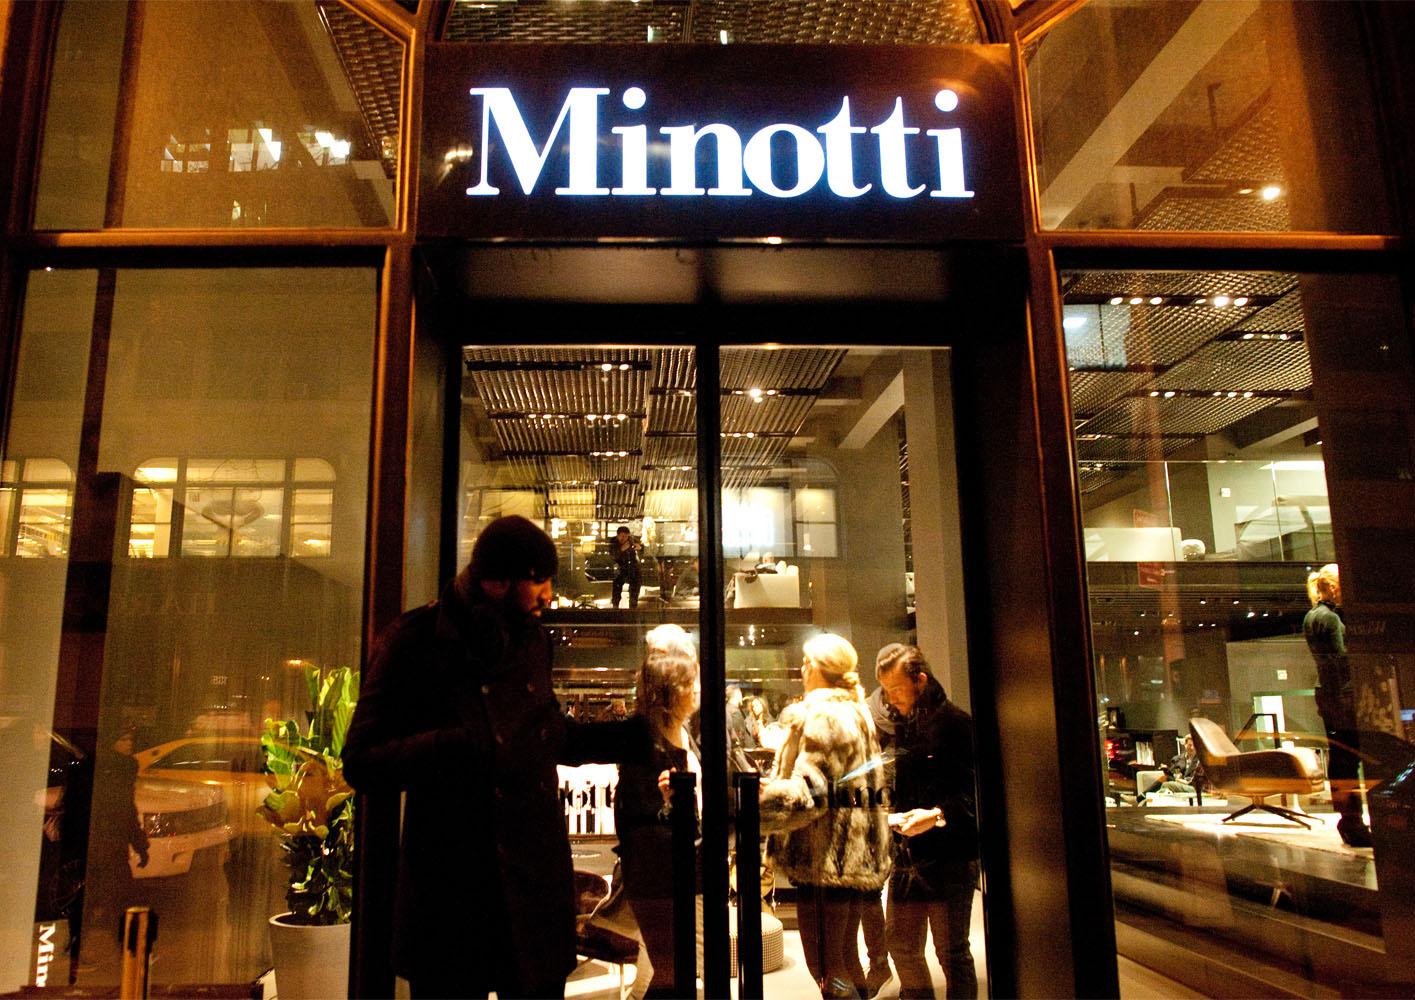 minotti new york architectural digest 2013 (1)